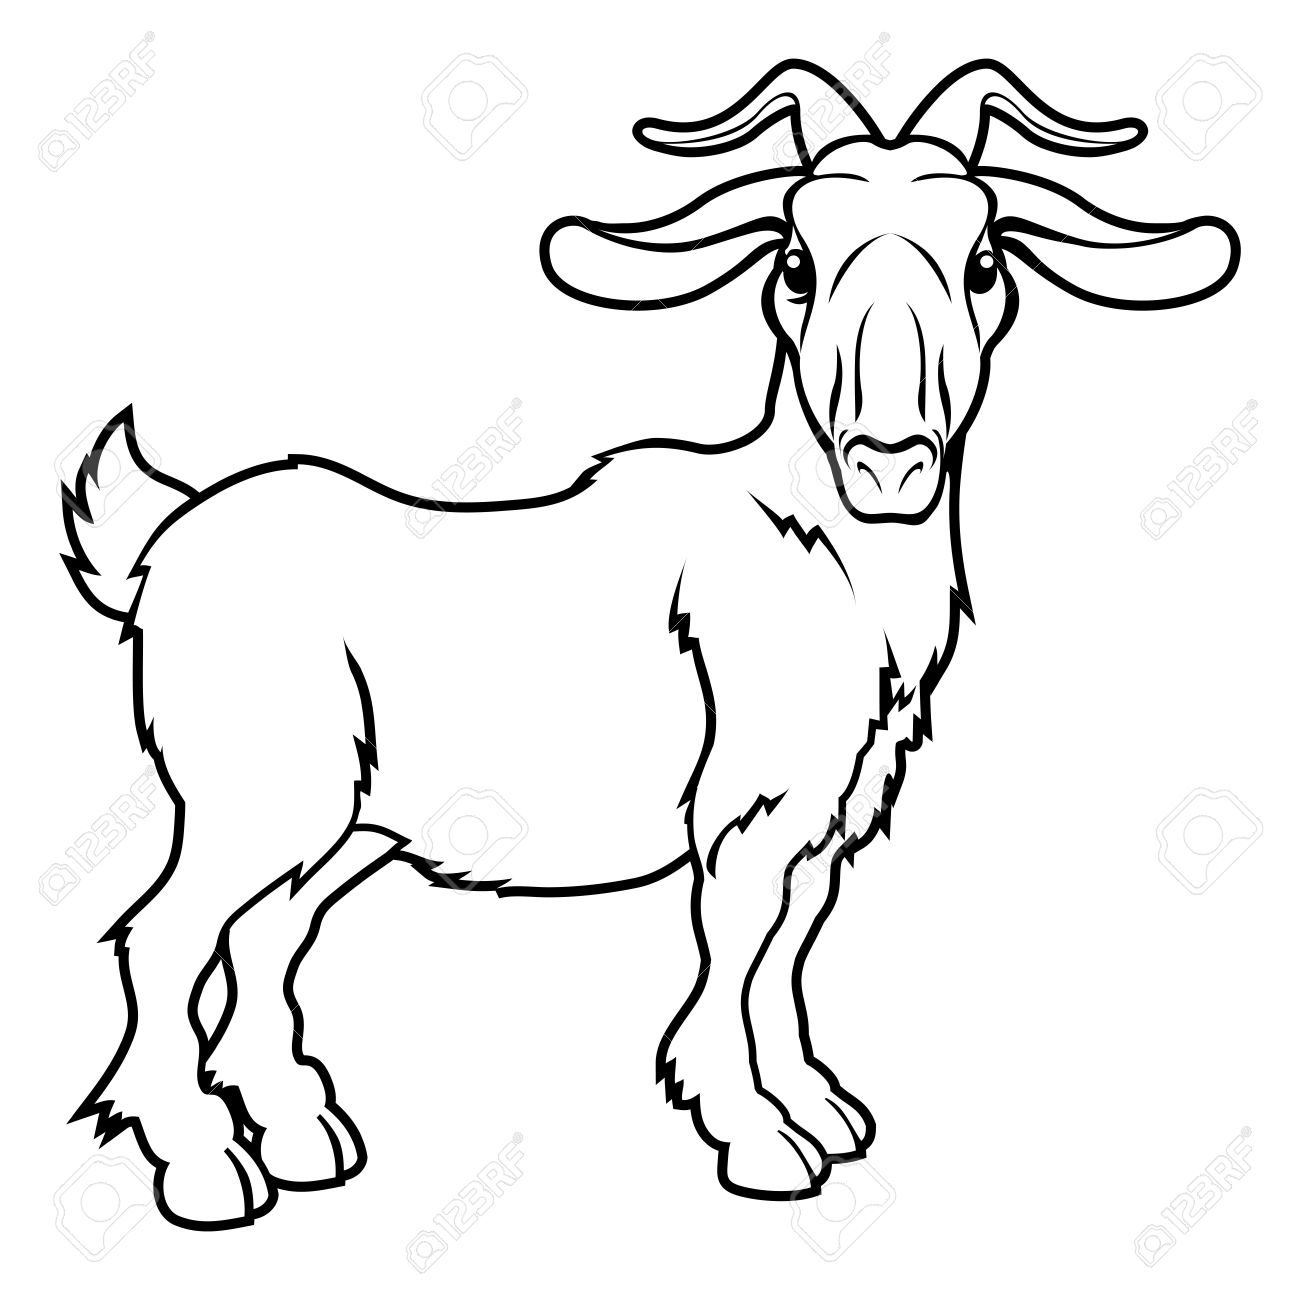 1300x1290 Inspiring Goat Tattoo Designs